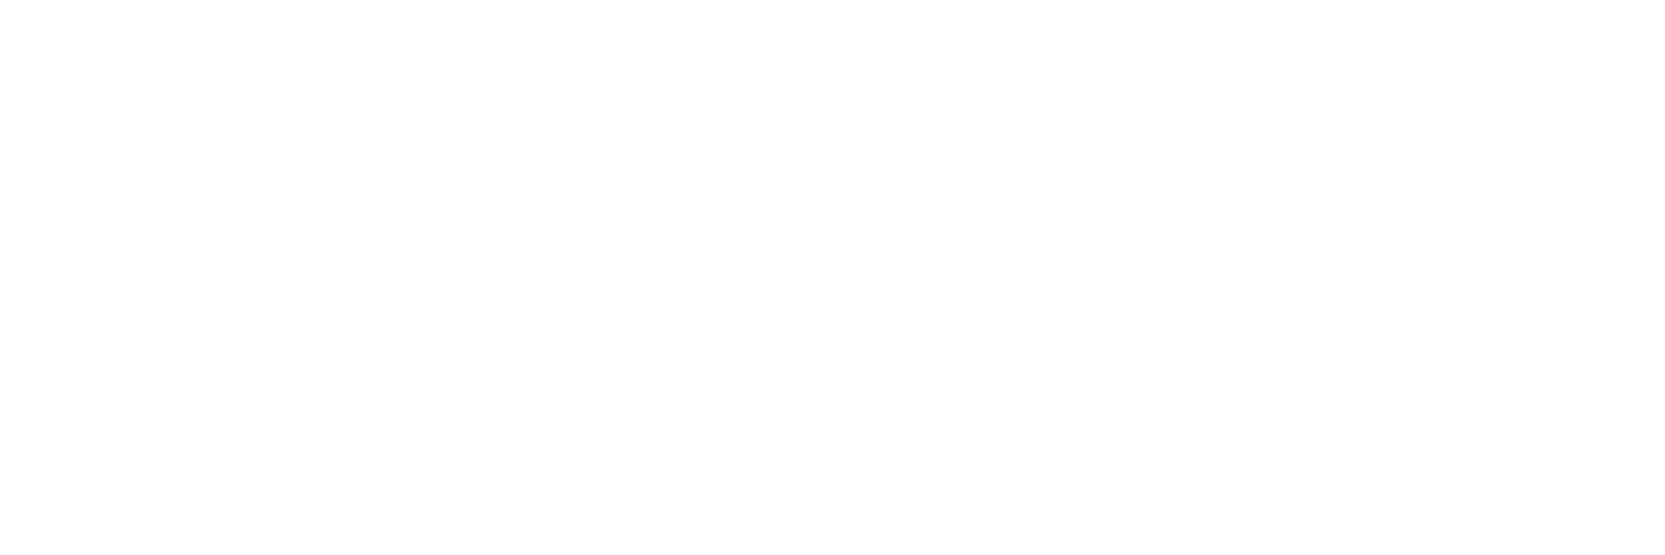 Caprice Countertops